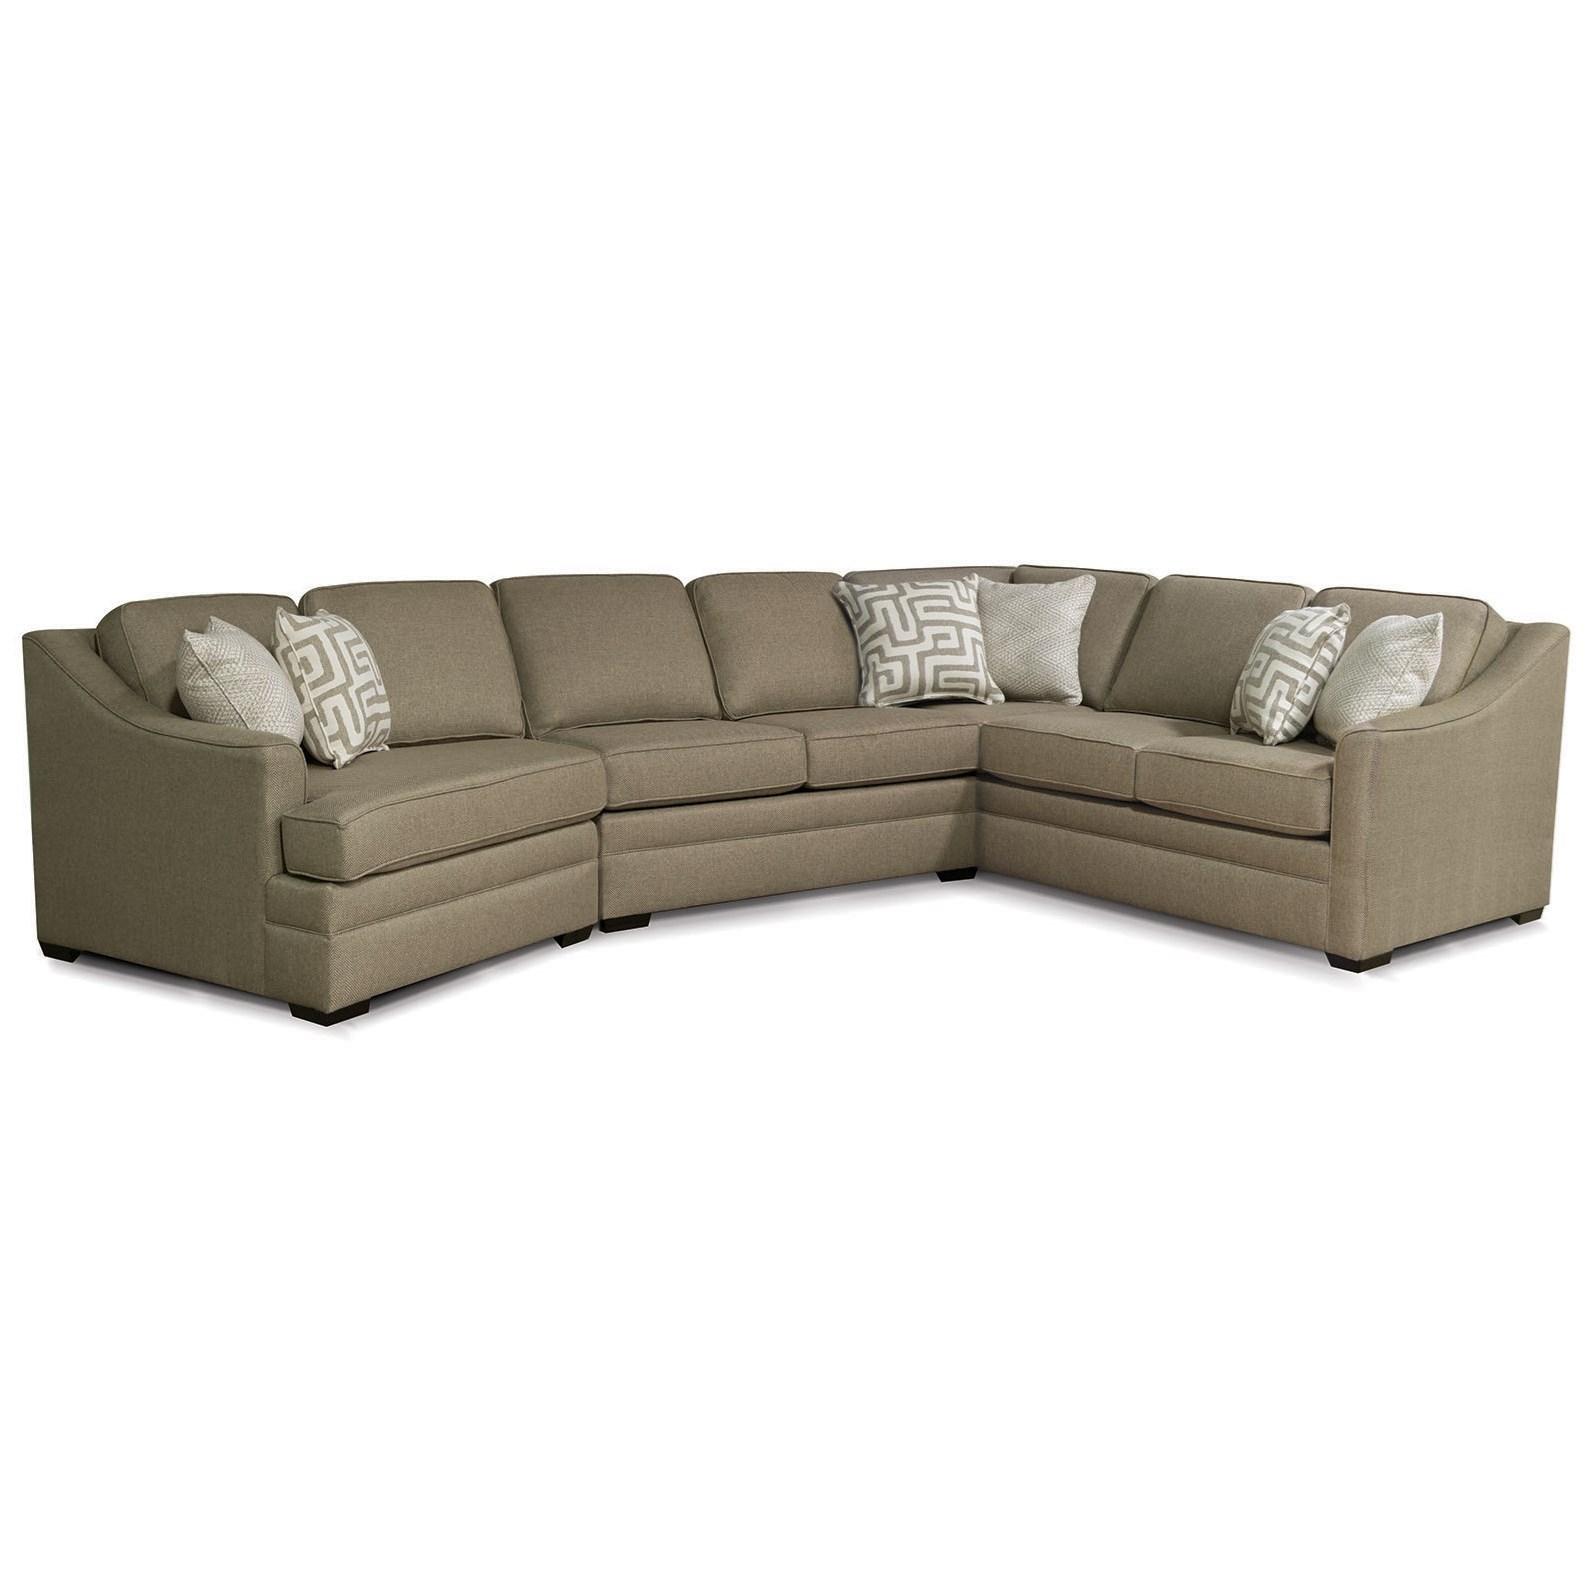 England Thomas Sectional Sofa With Cuddler